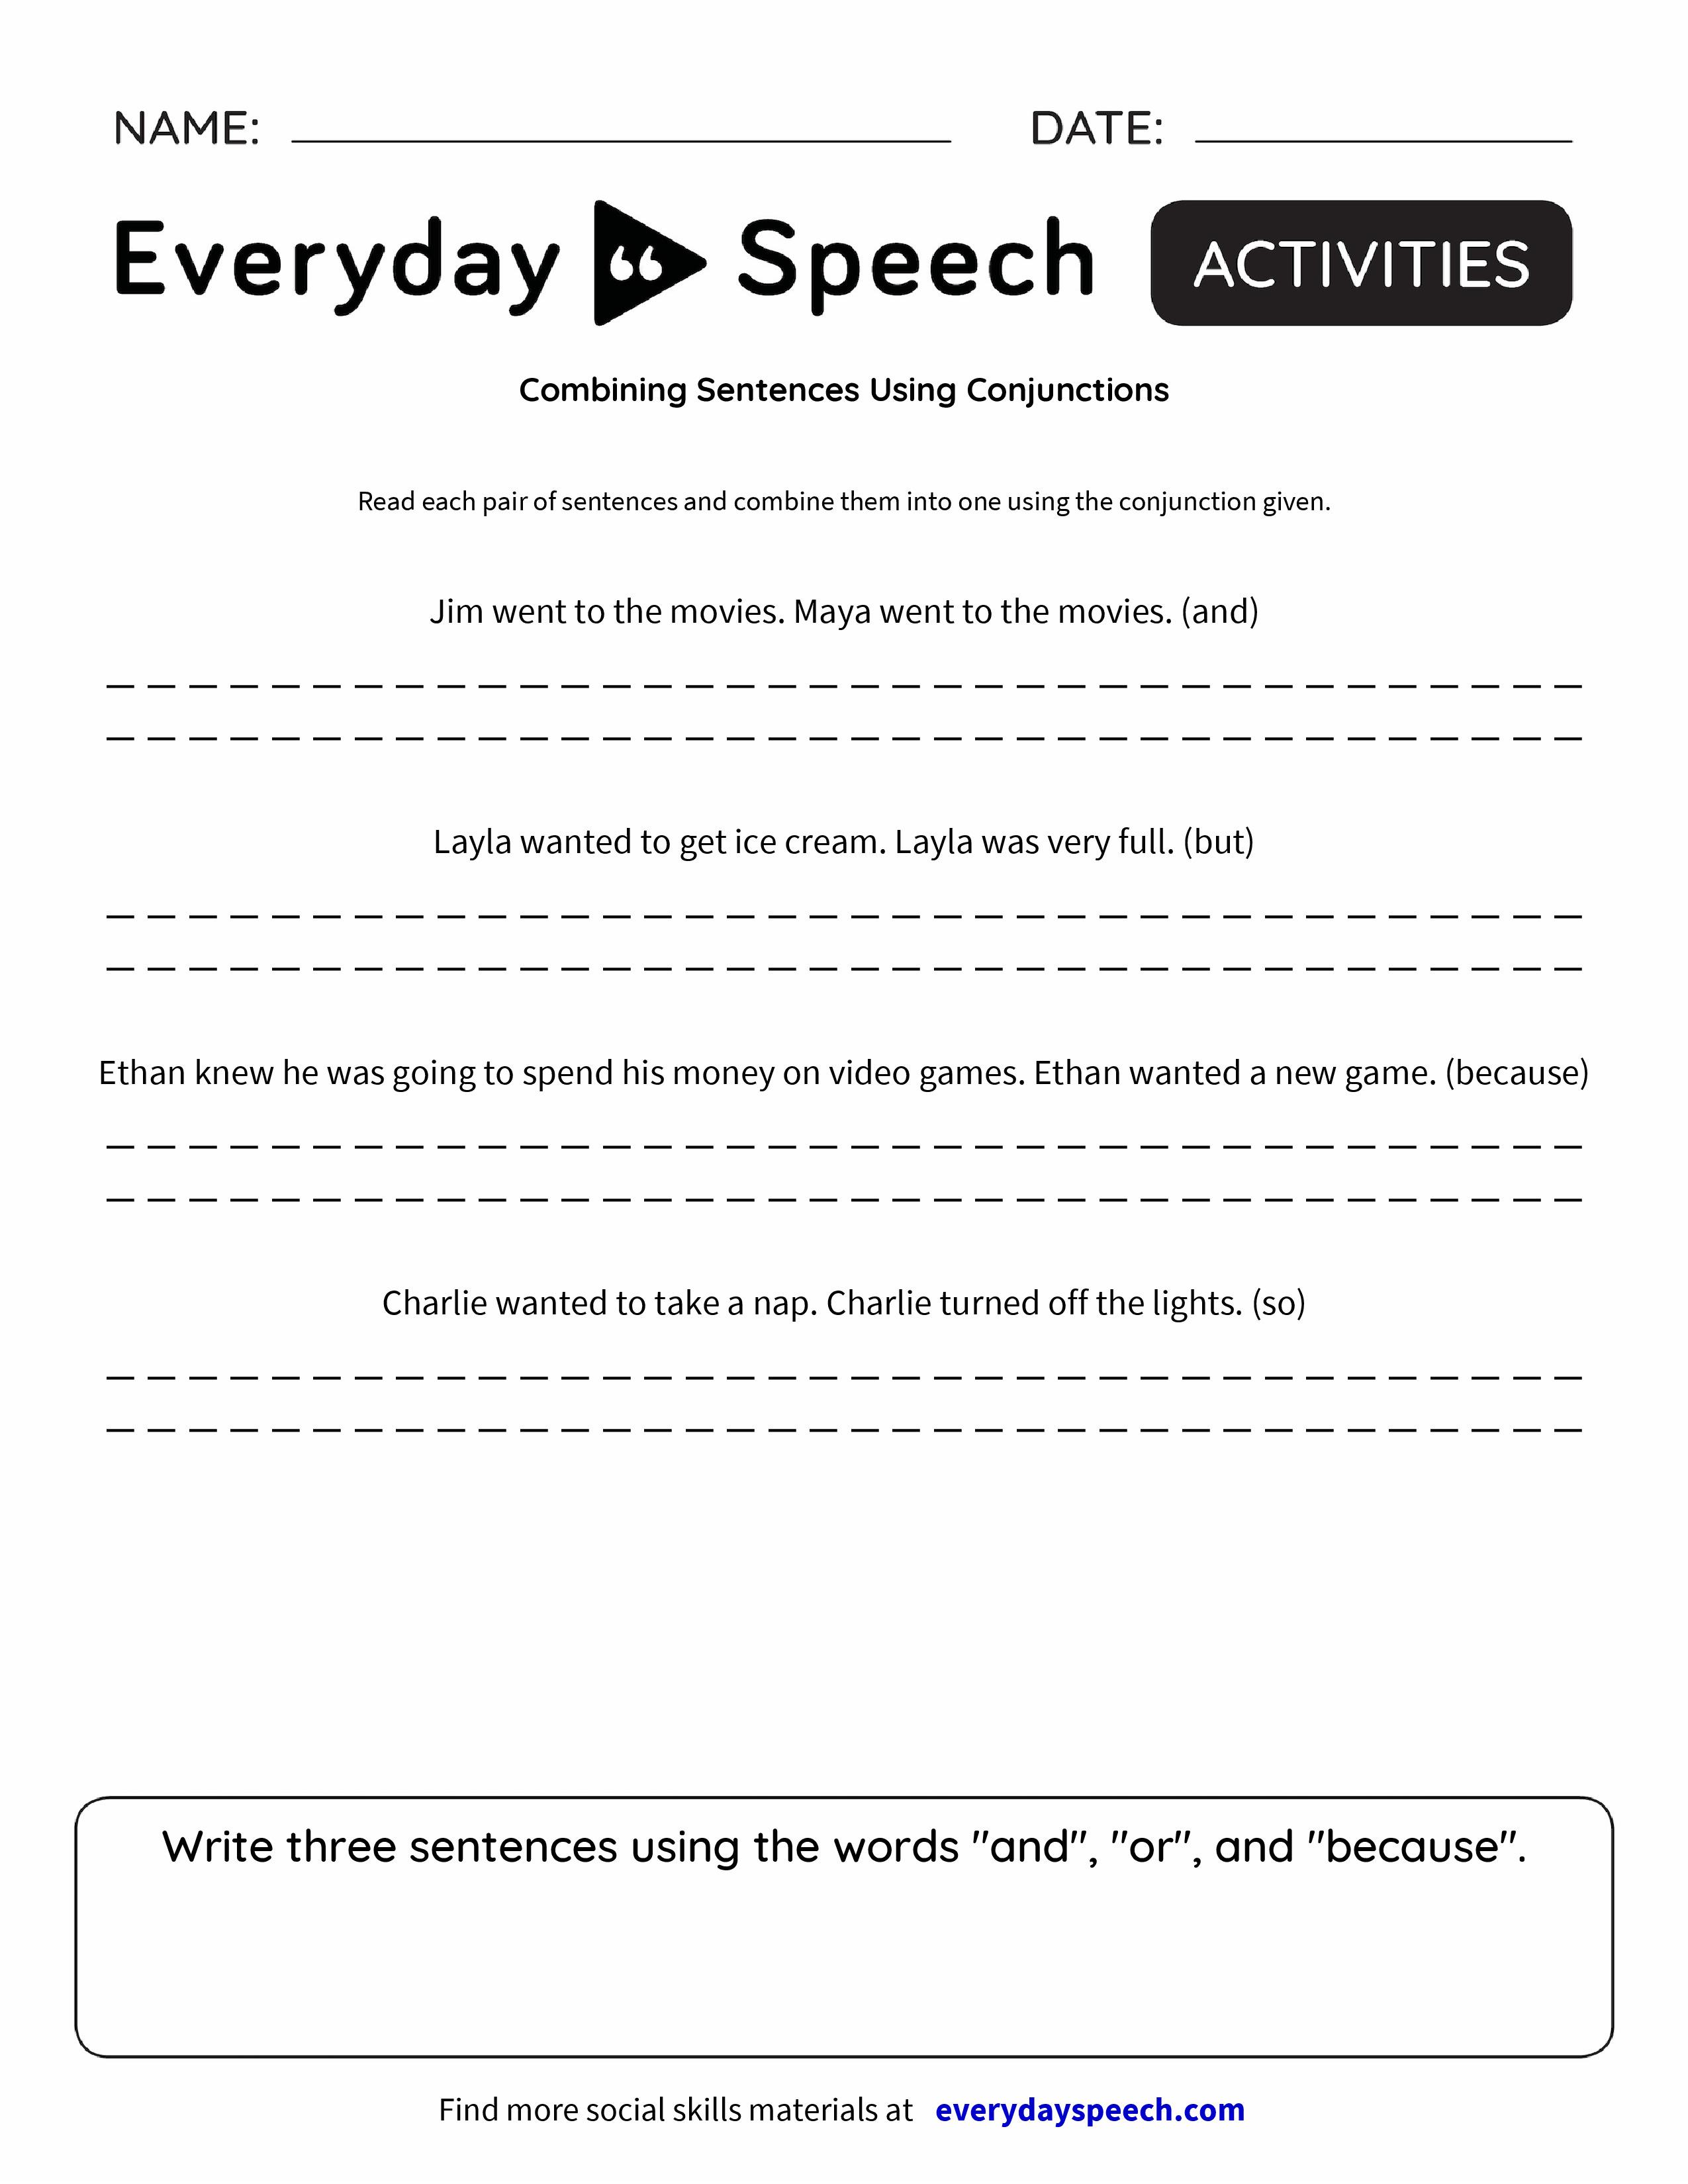 B G Sentences Us G C Juncti S Everyd Y Speech